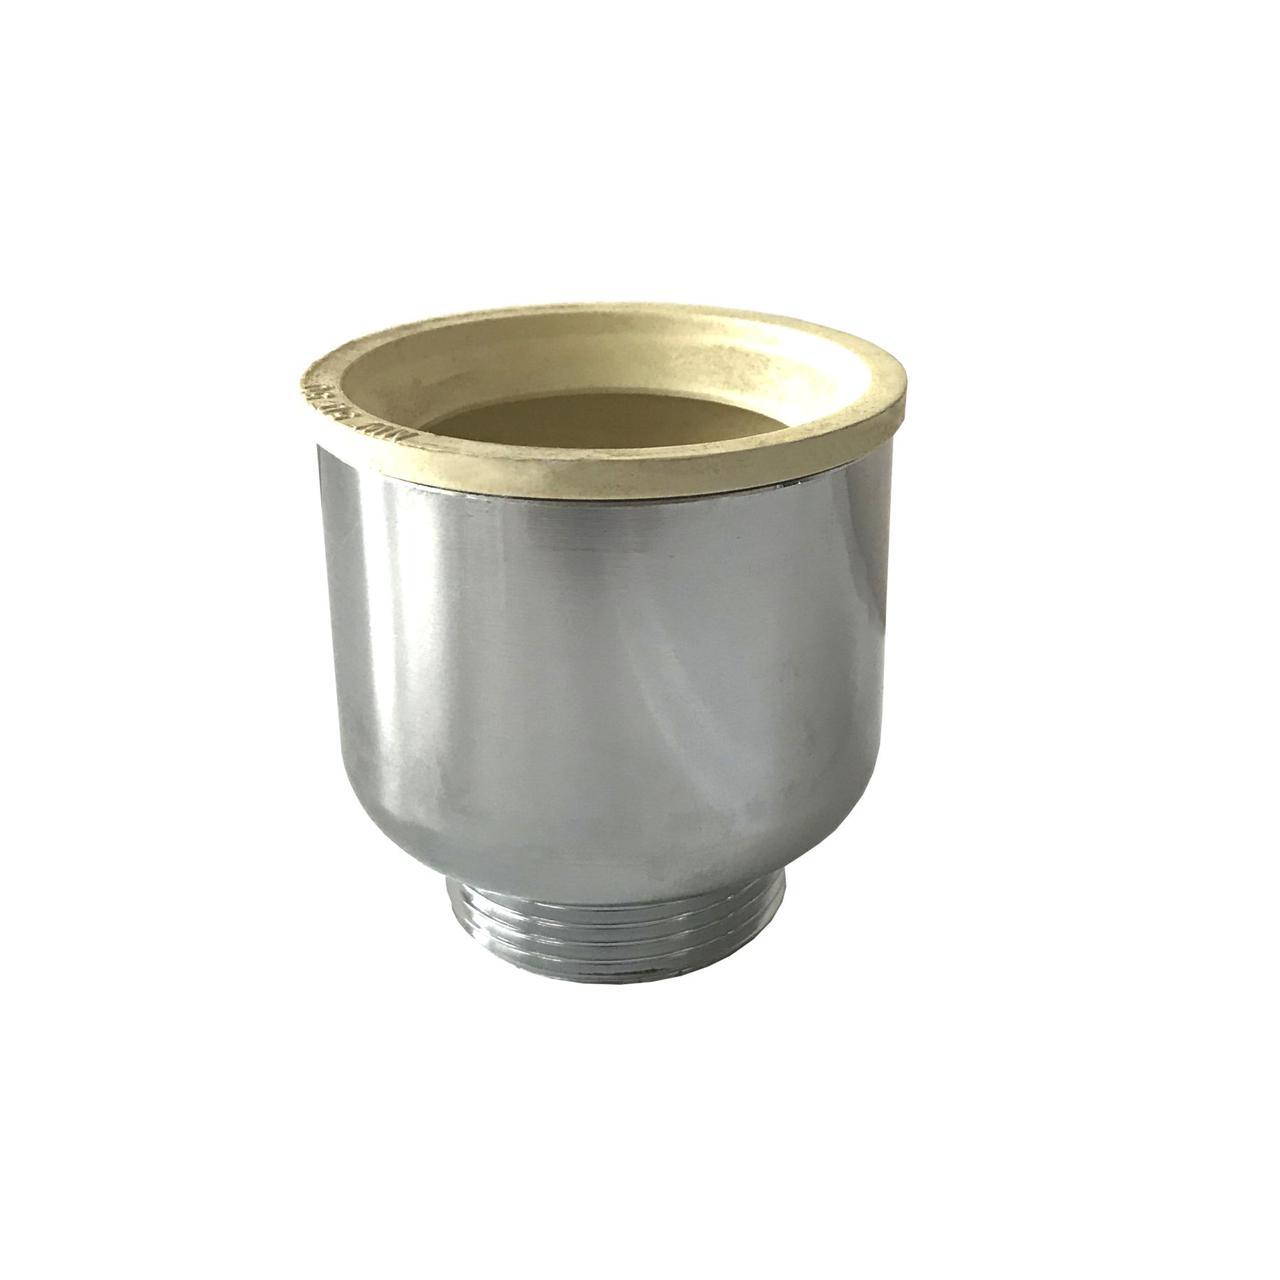 Писсуарный стакан (Головка ф32), хром VIEGA GmbH